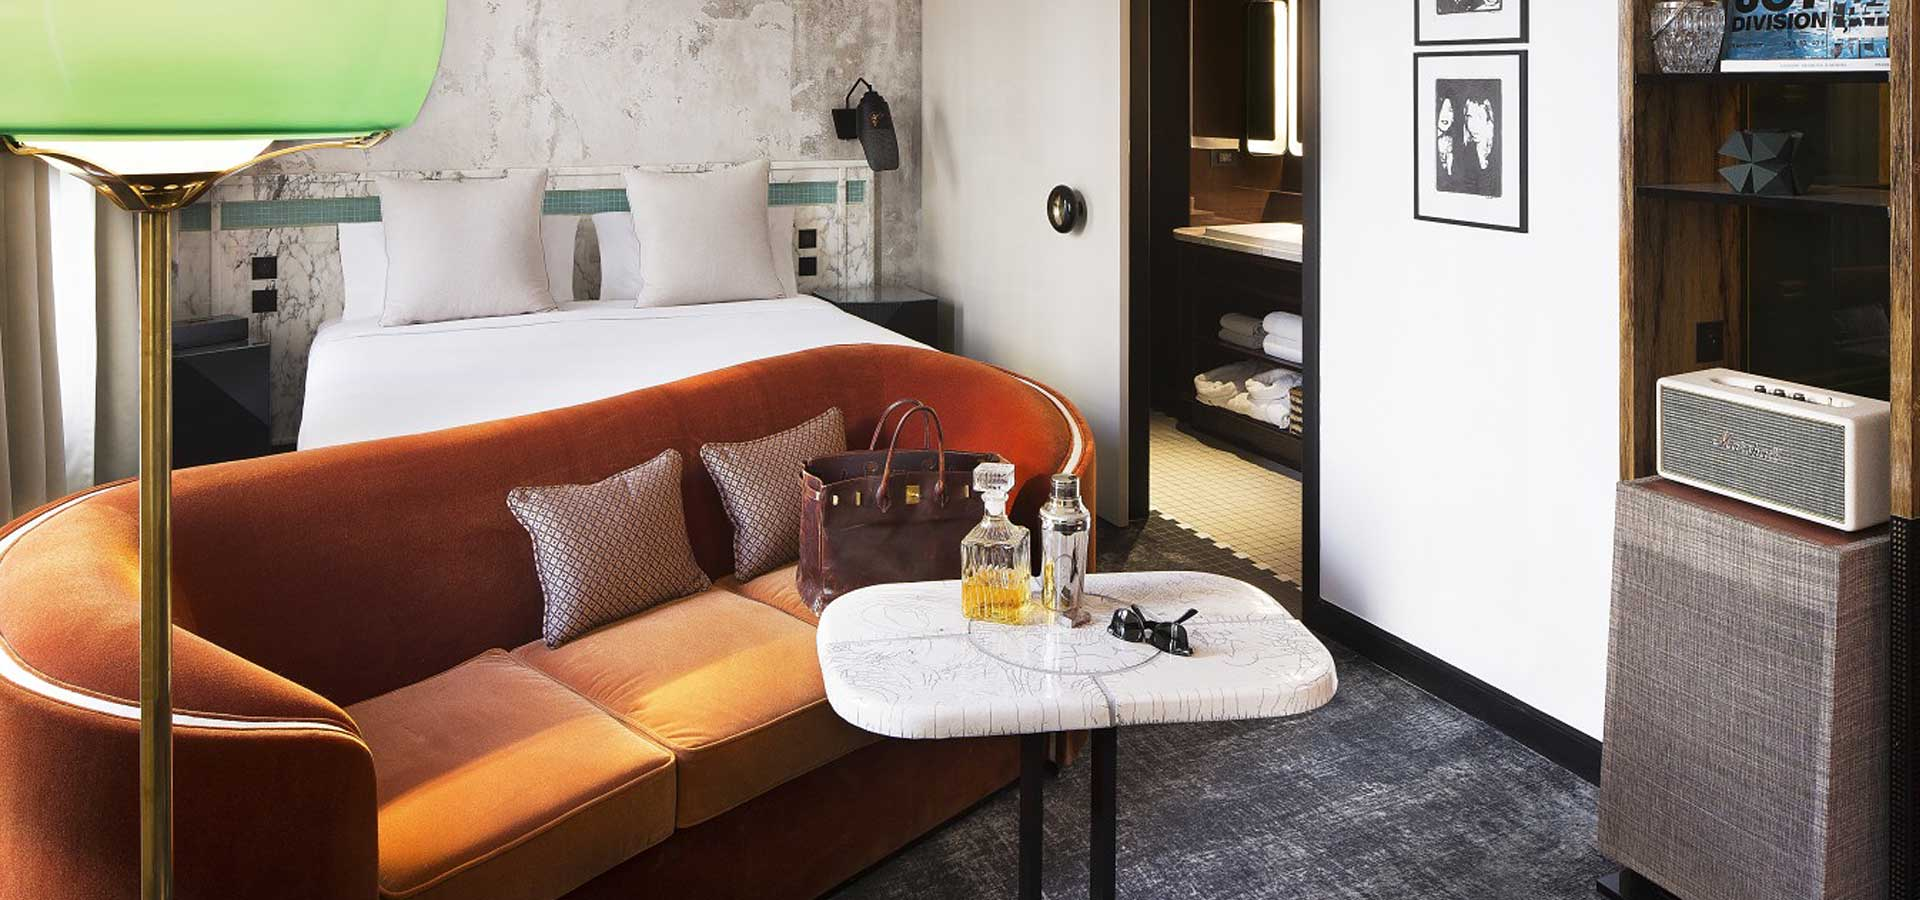 Project Hotel Les Bains By Fabienne L Hostis Raku Ceramics